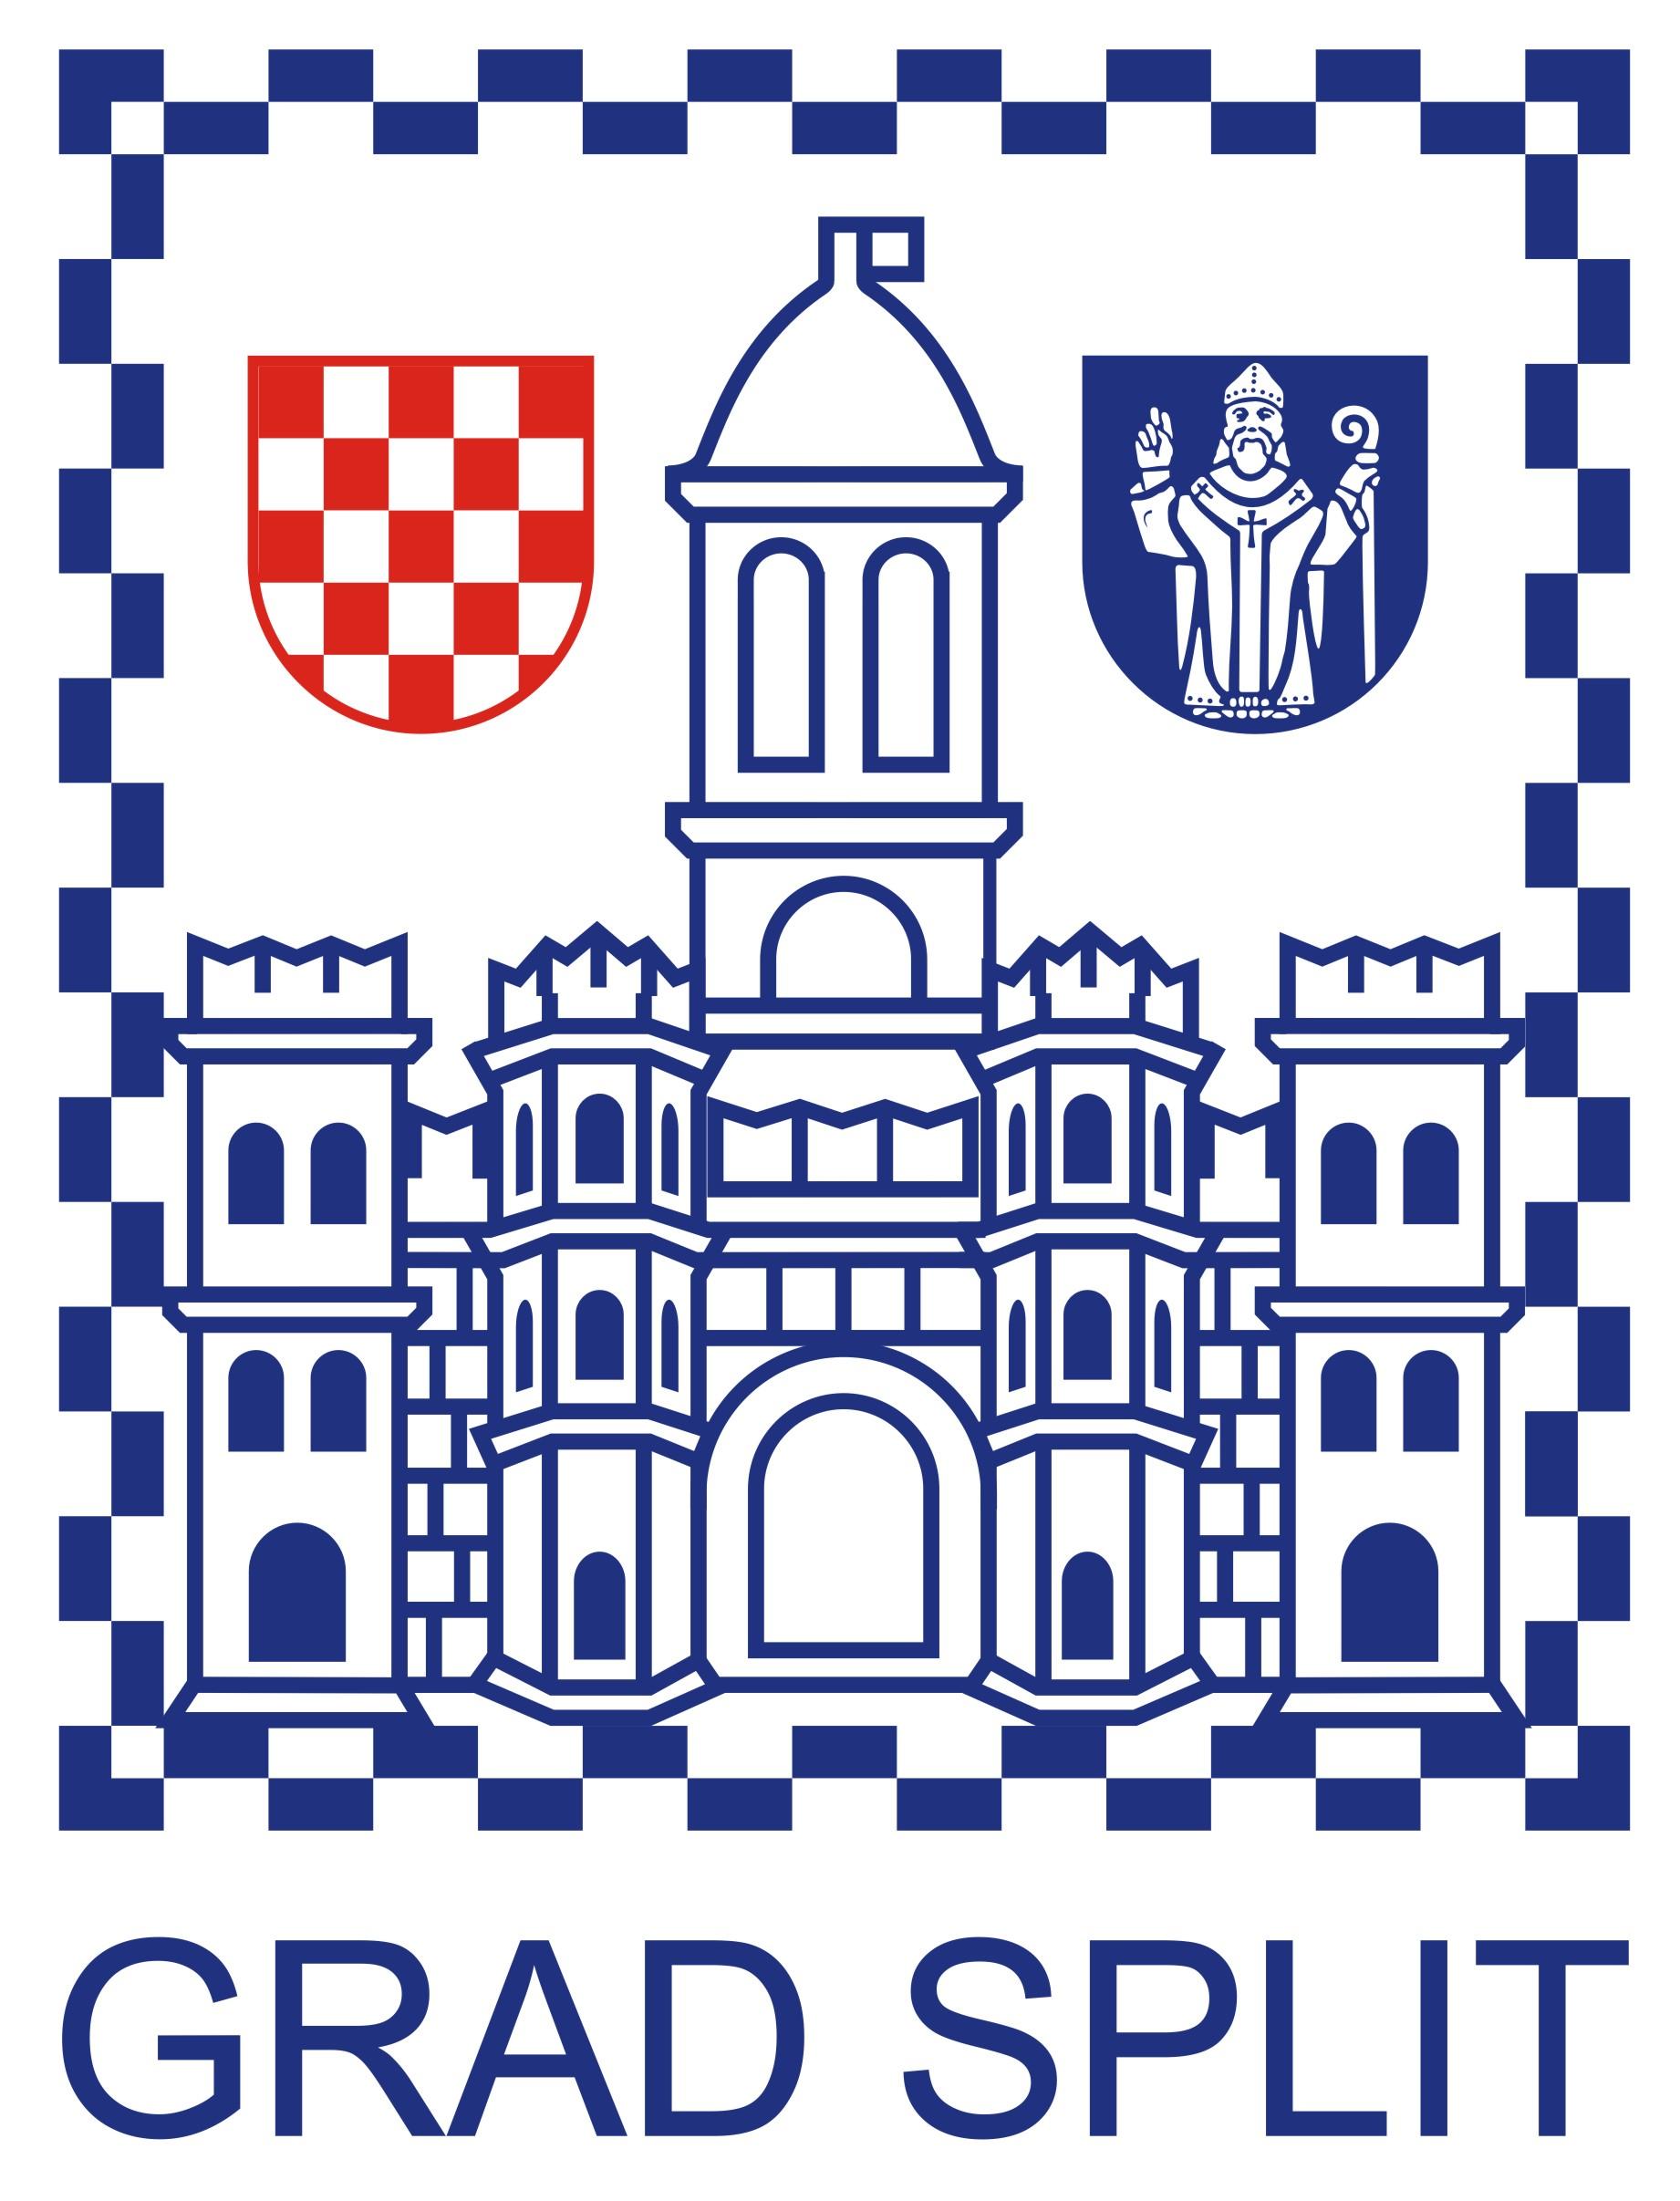 Grad_Split